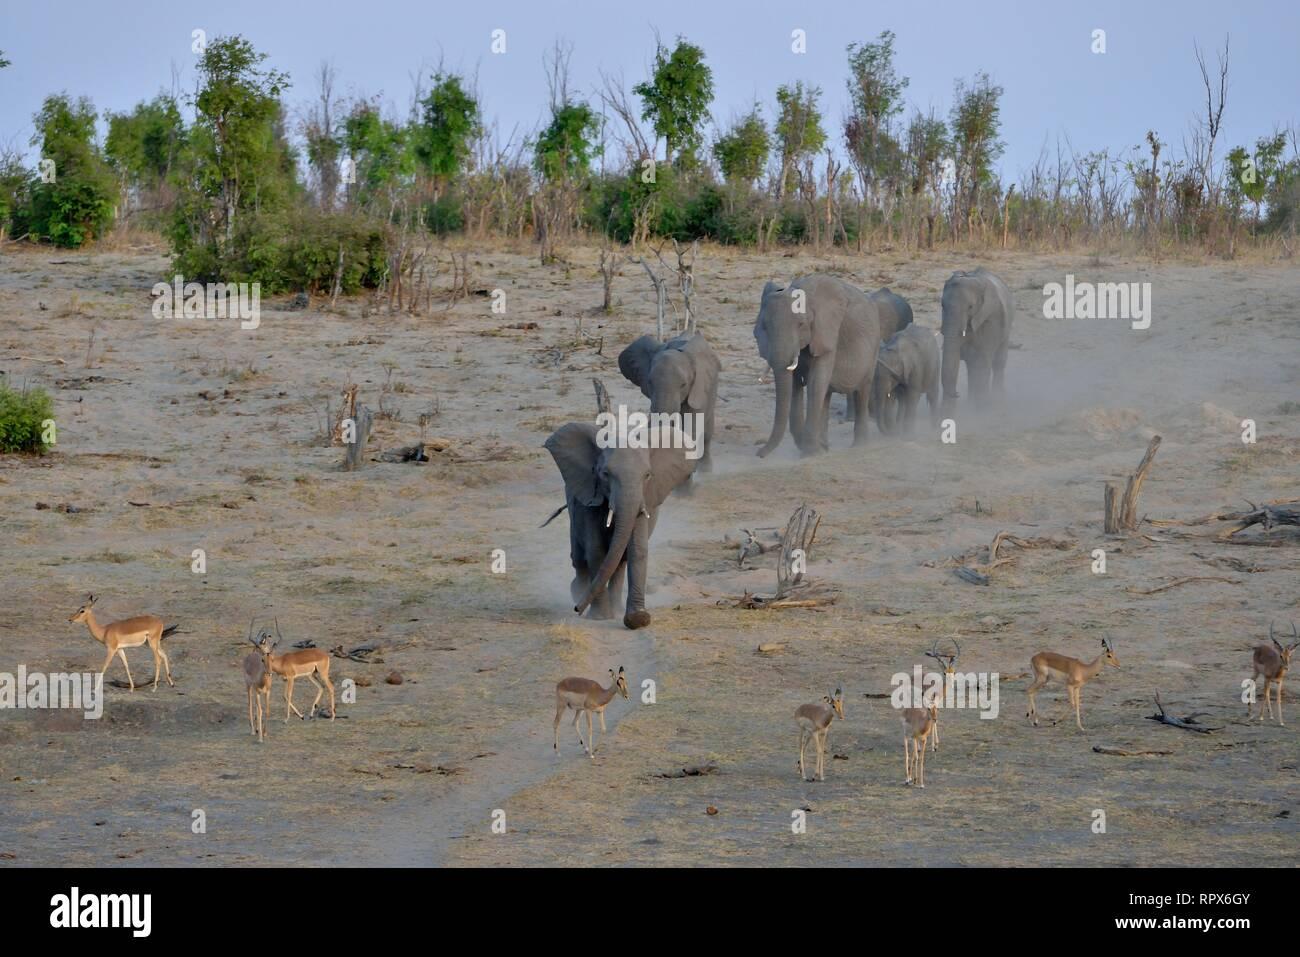 Zoologie, Säugetiere (Mammalia), Elefant (Loxodonta africana) in der Nähe der Somalisa Camp, Hwange National Park, Additional-Rights - Clearance-Info - Not-Available Stockbild